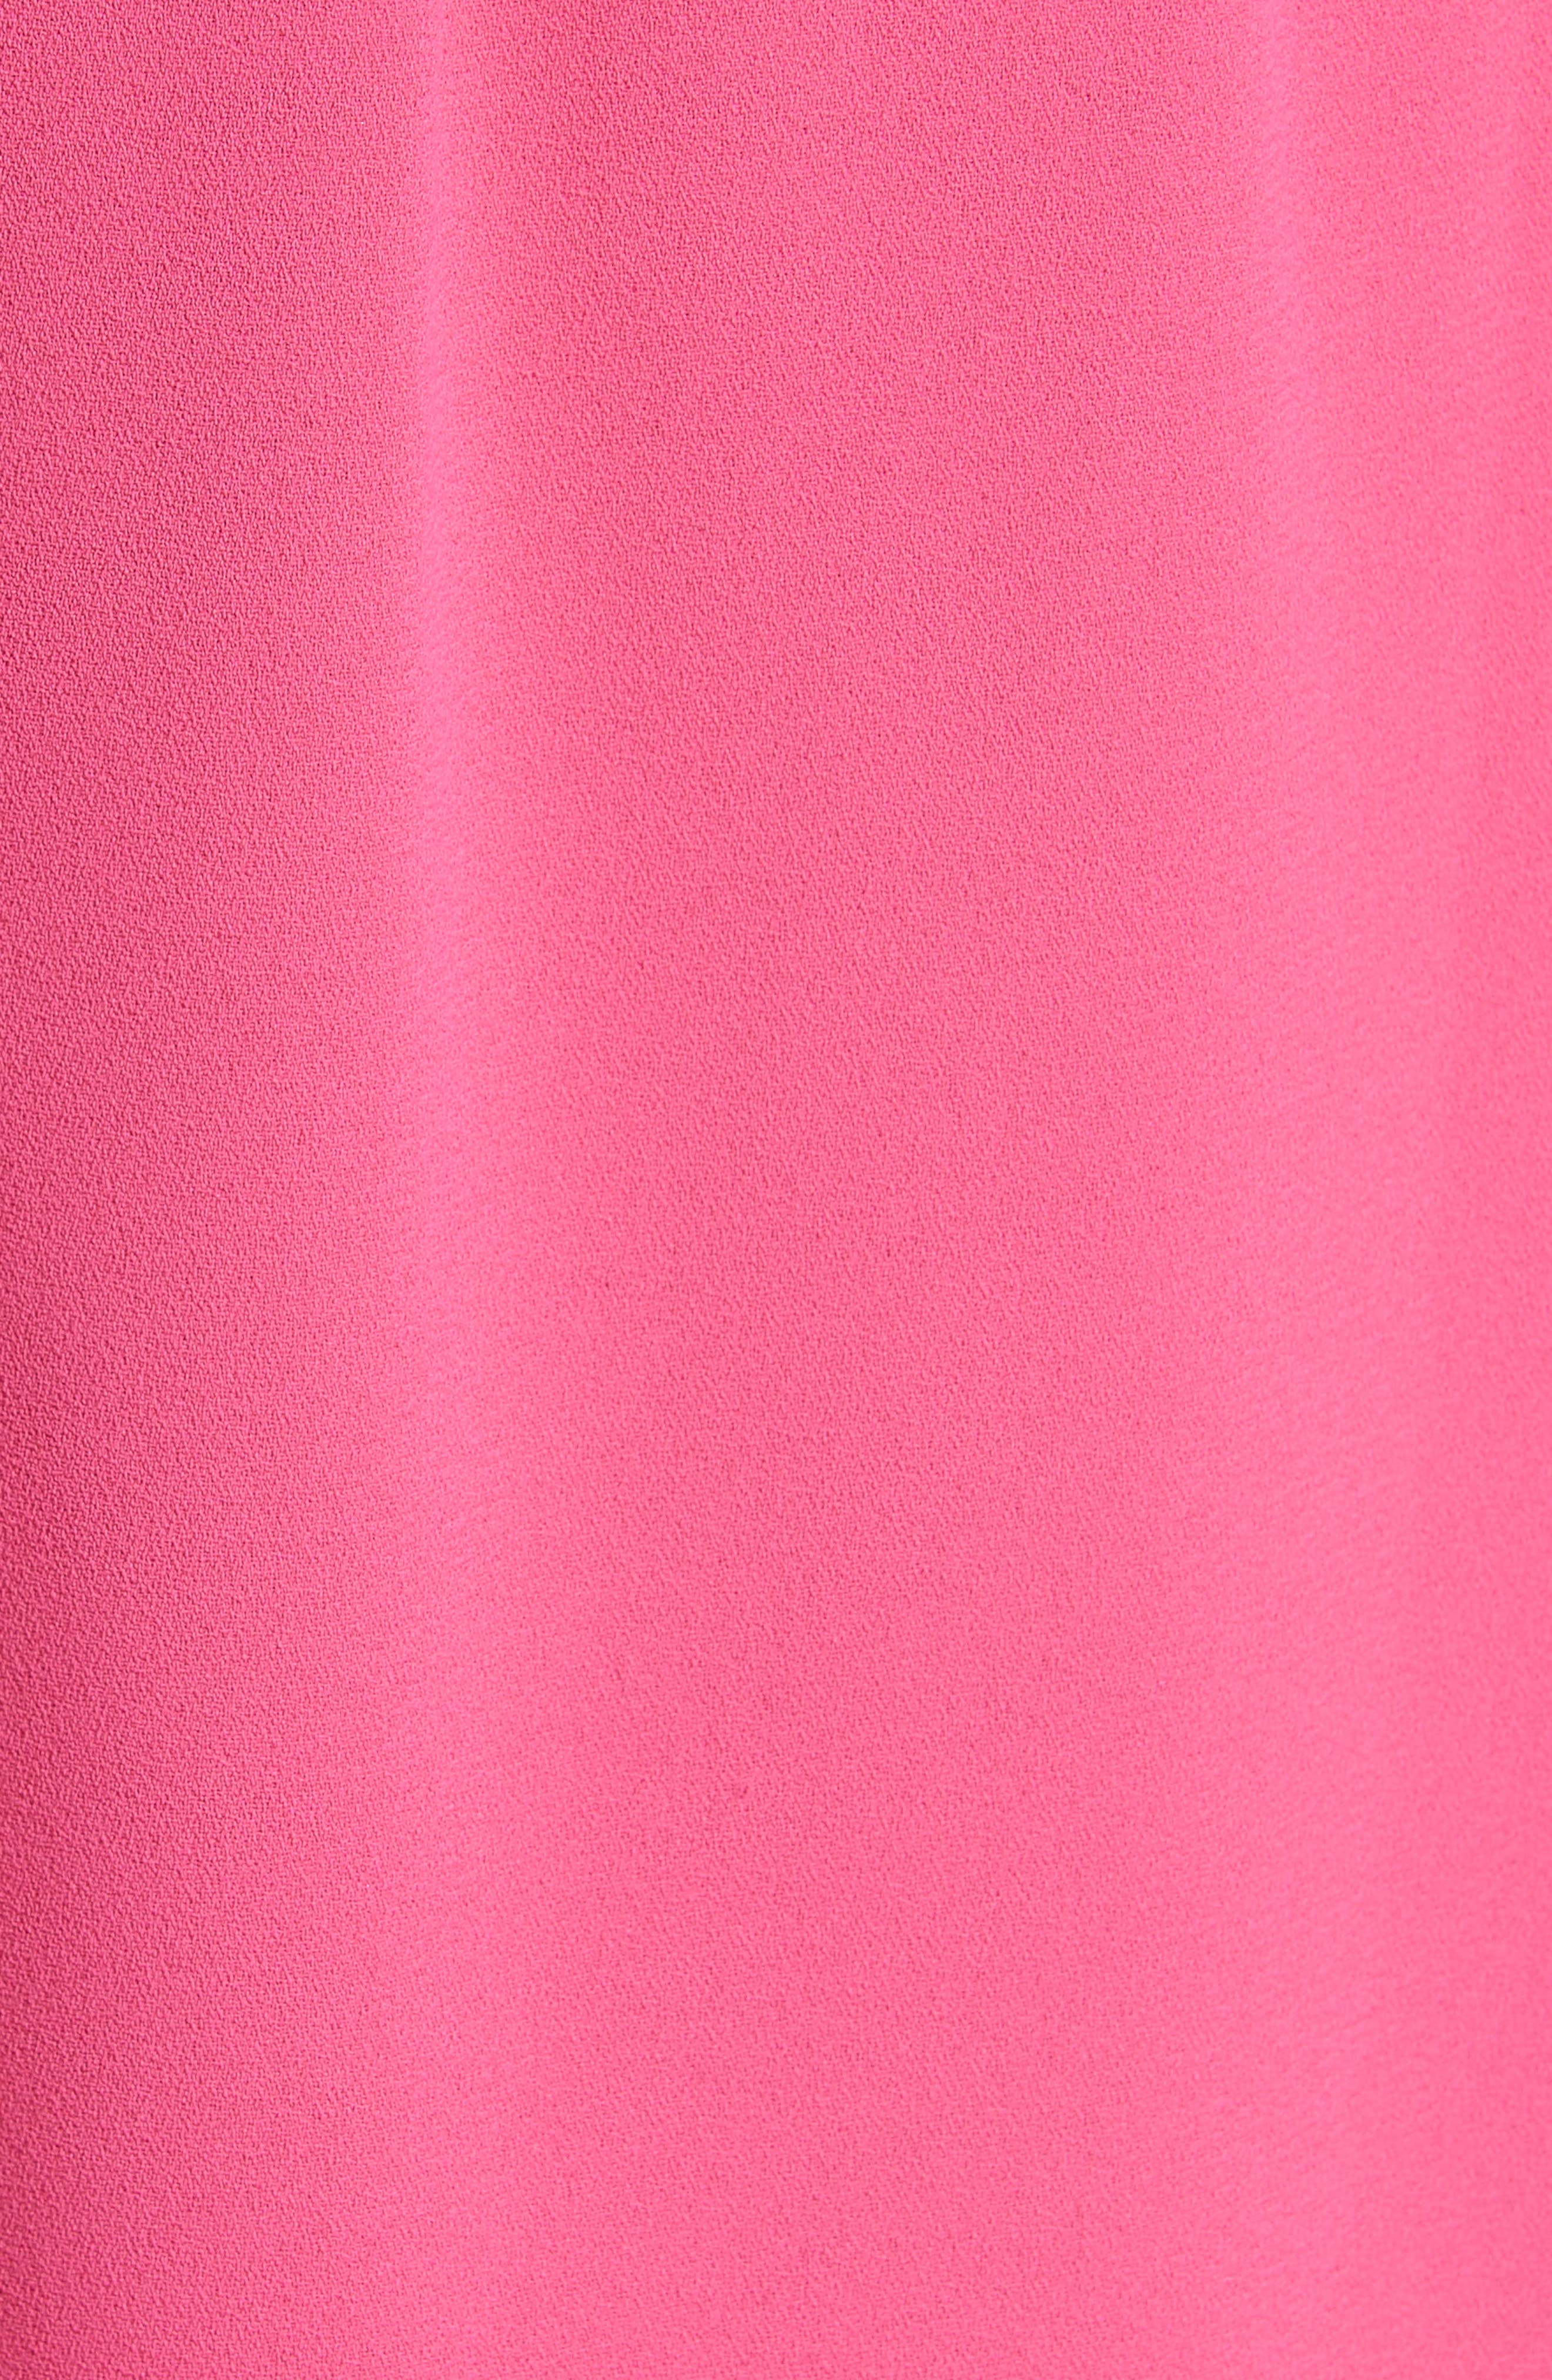 Shavon High Waist Side Slit Flare Pants,                             Alternate thumbnail 5, color,                             Fuchsia